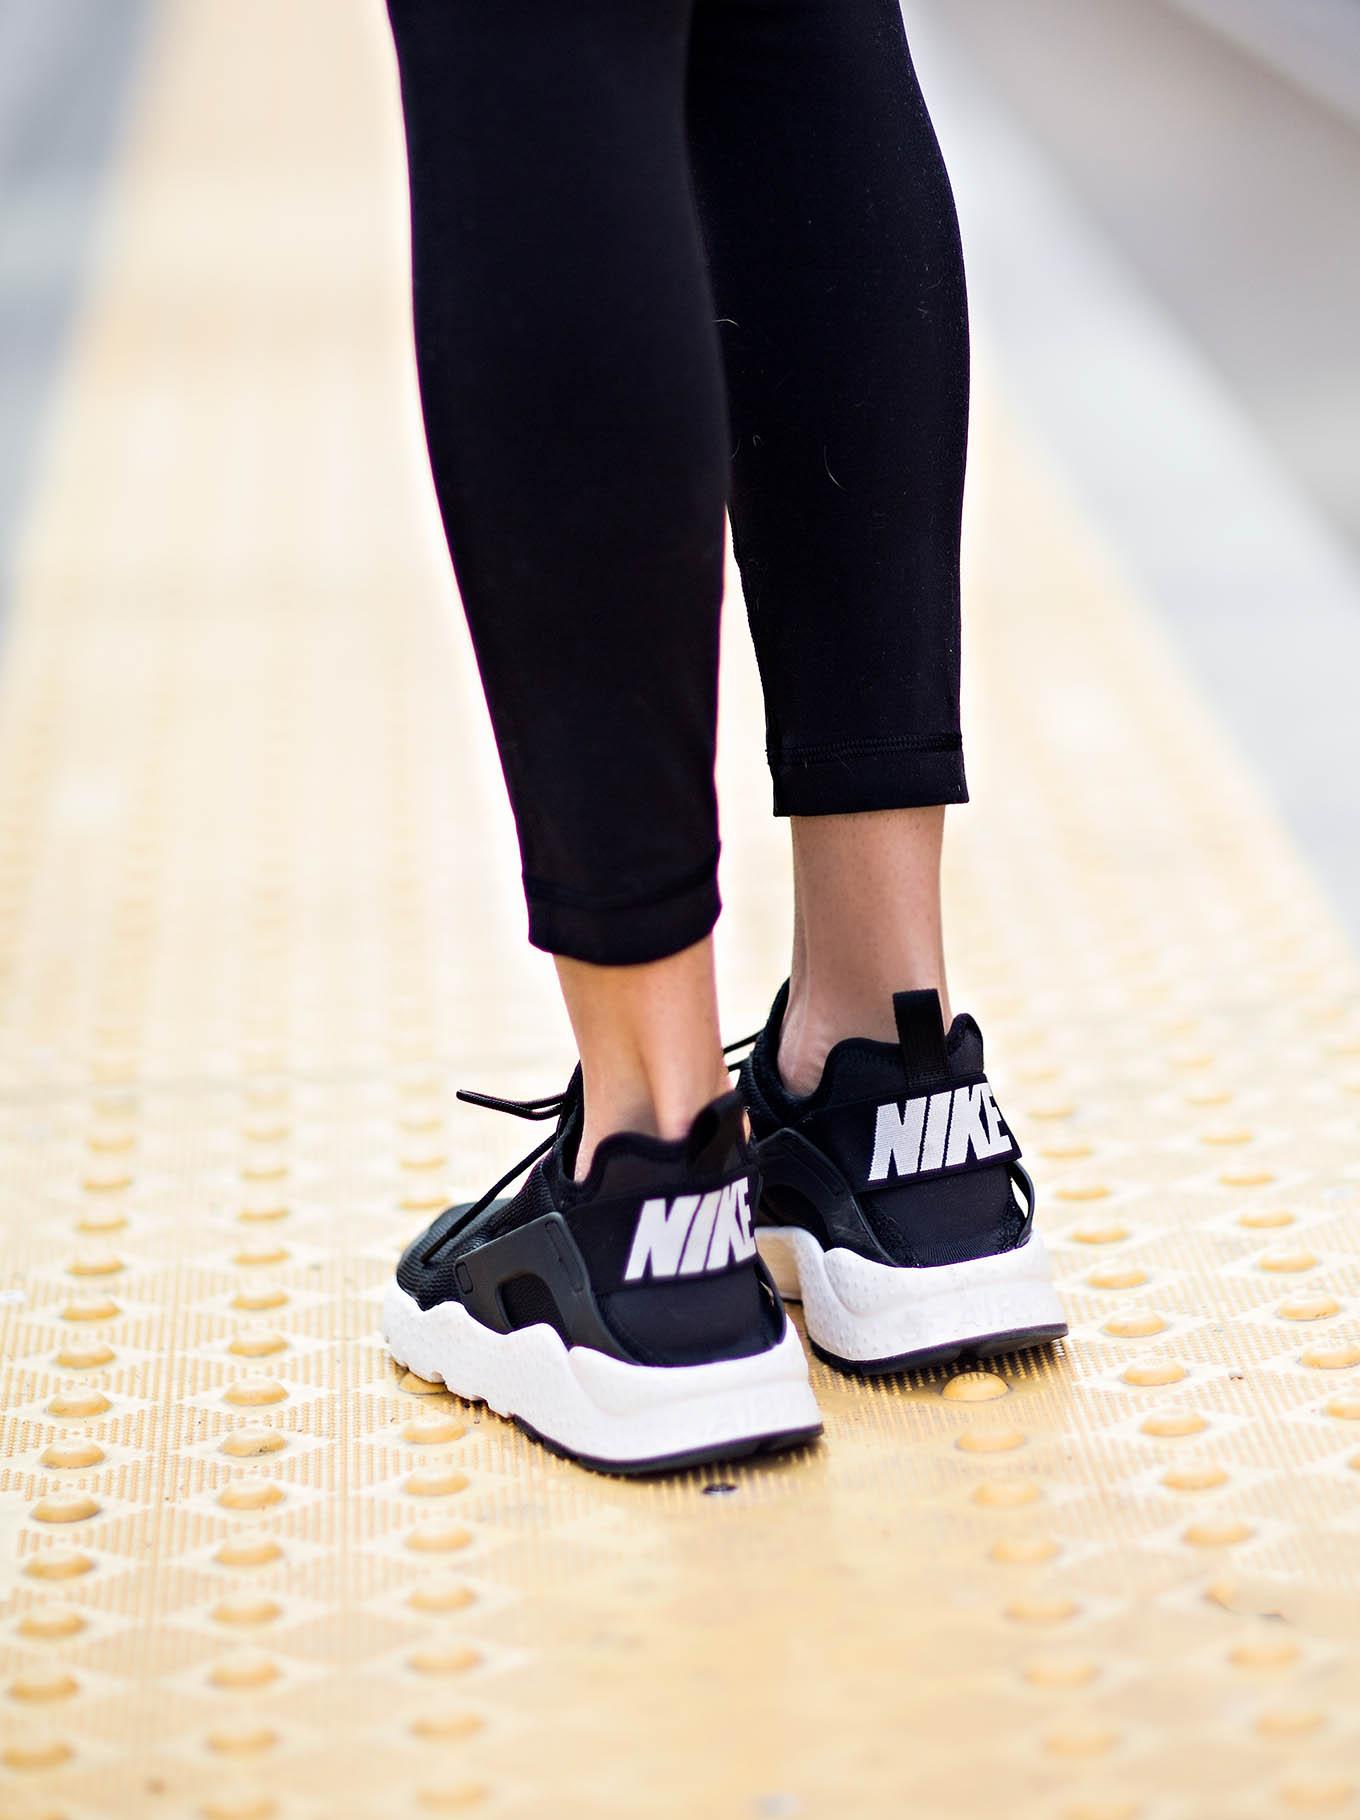 black women nike shoes hello fashion blog